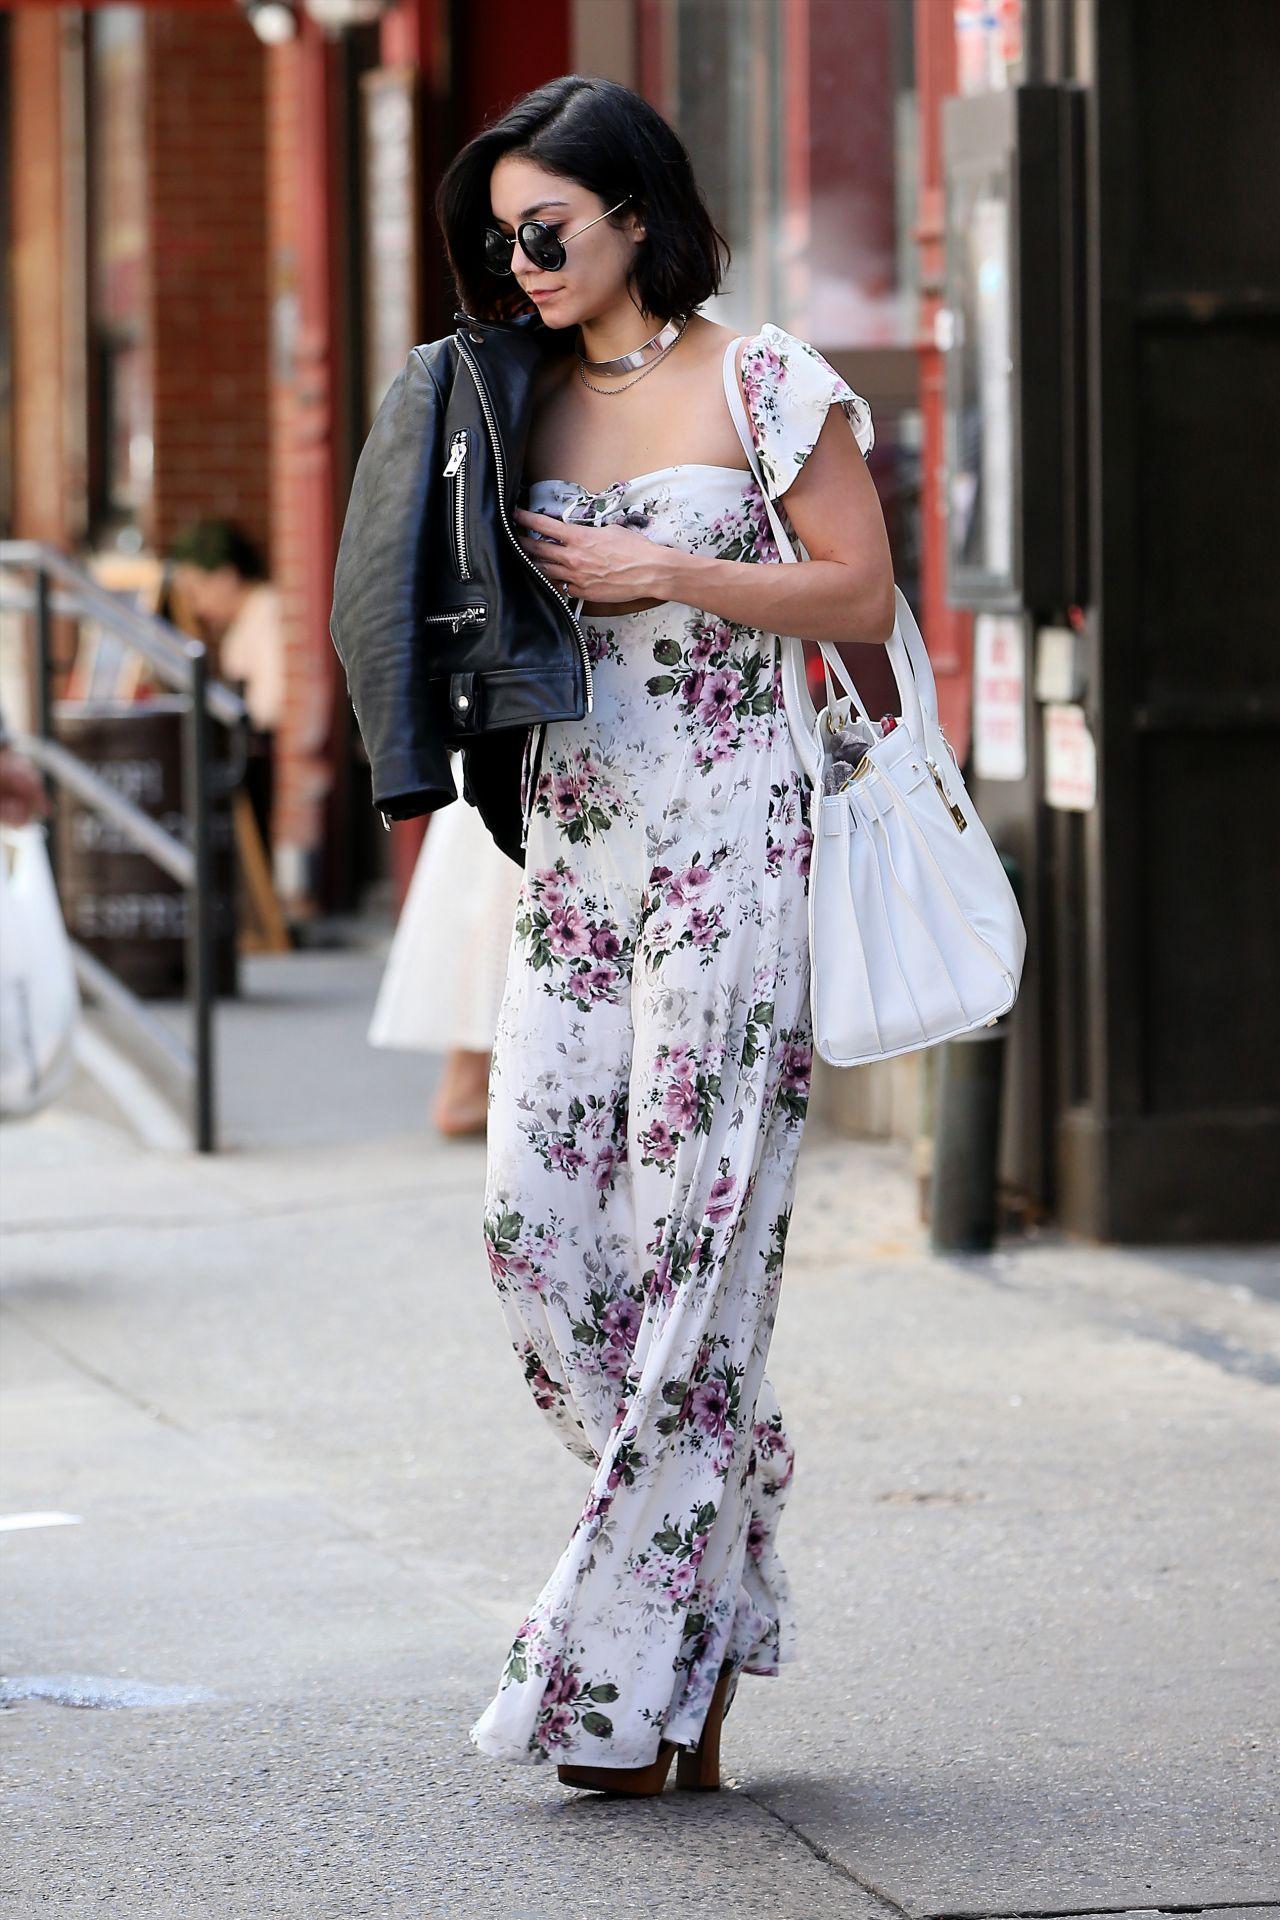 Vanessa Hudgens Street Fashion Out In Soho New York City April 2015